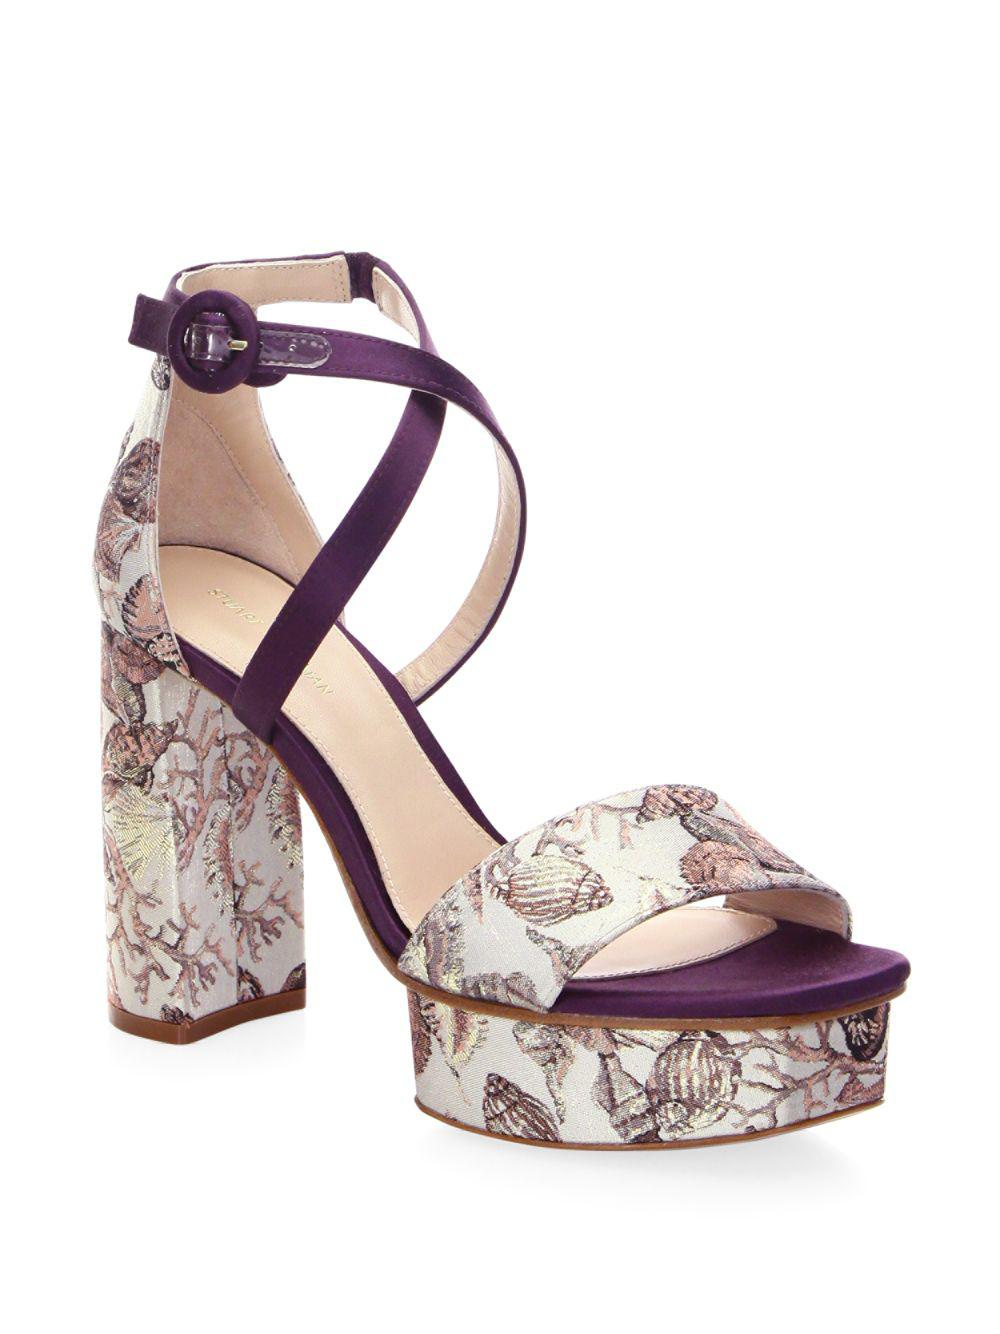 dcb2645d7048 Stuart Weitzman Carla Platform Sandals in Natural - Save 14% - Lyst